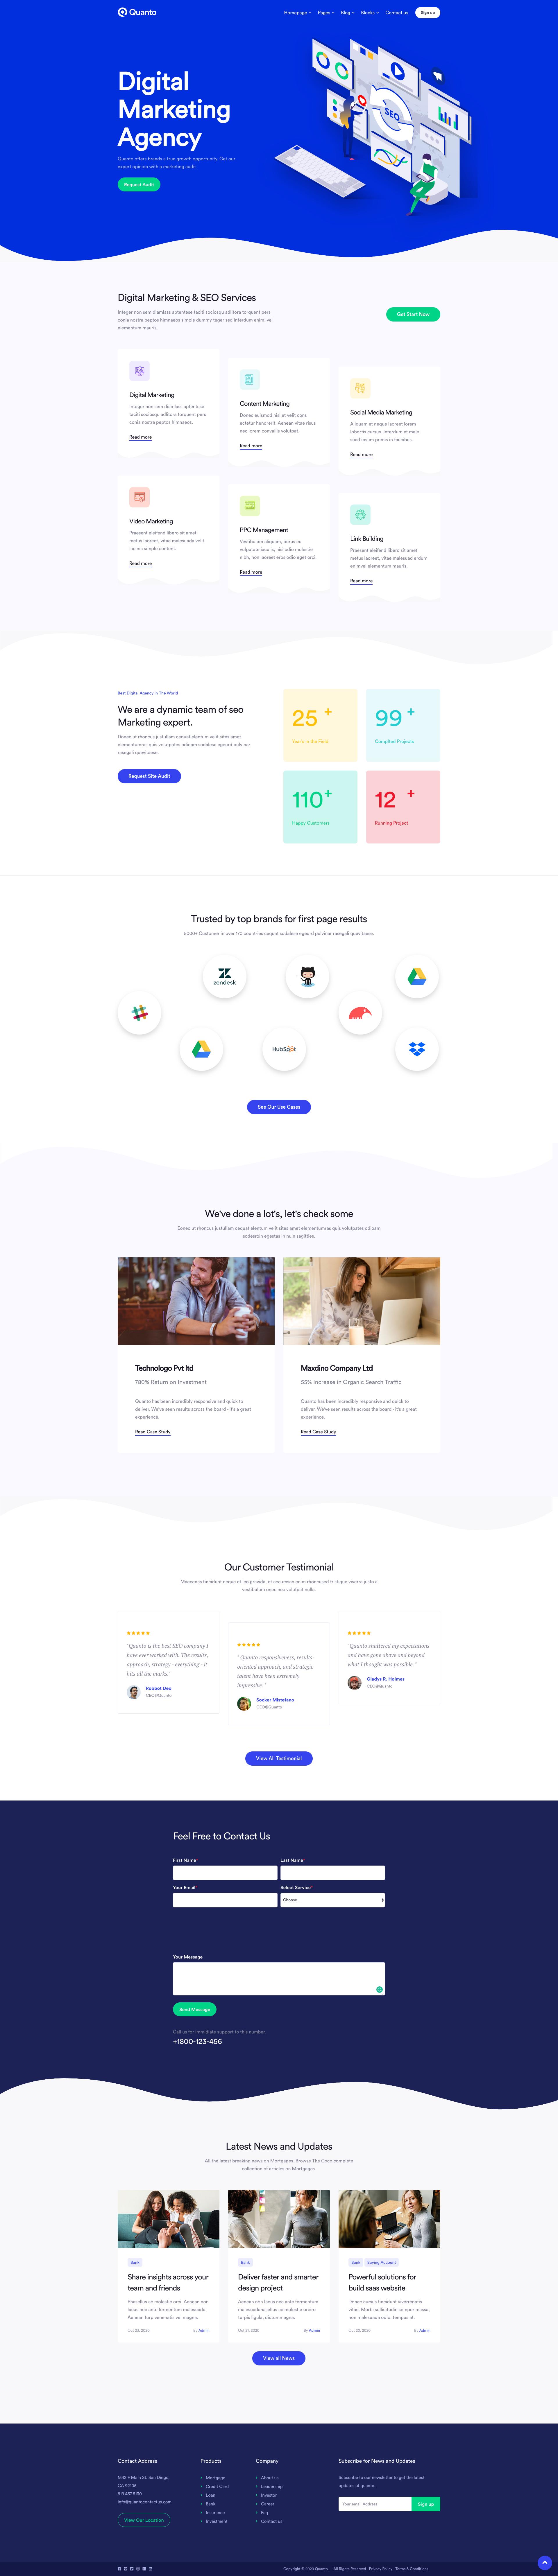 Digital Marketing Website Design Template 2020 In 2020 Marketing Website Website Template Design Digital Marketing